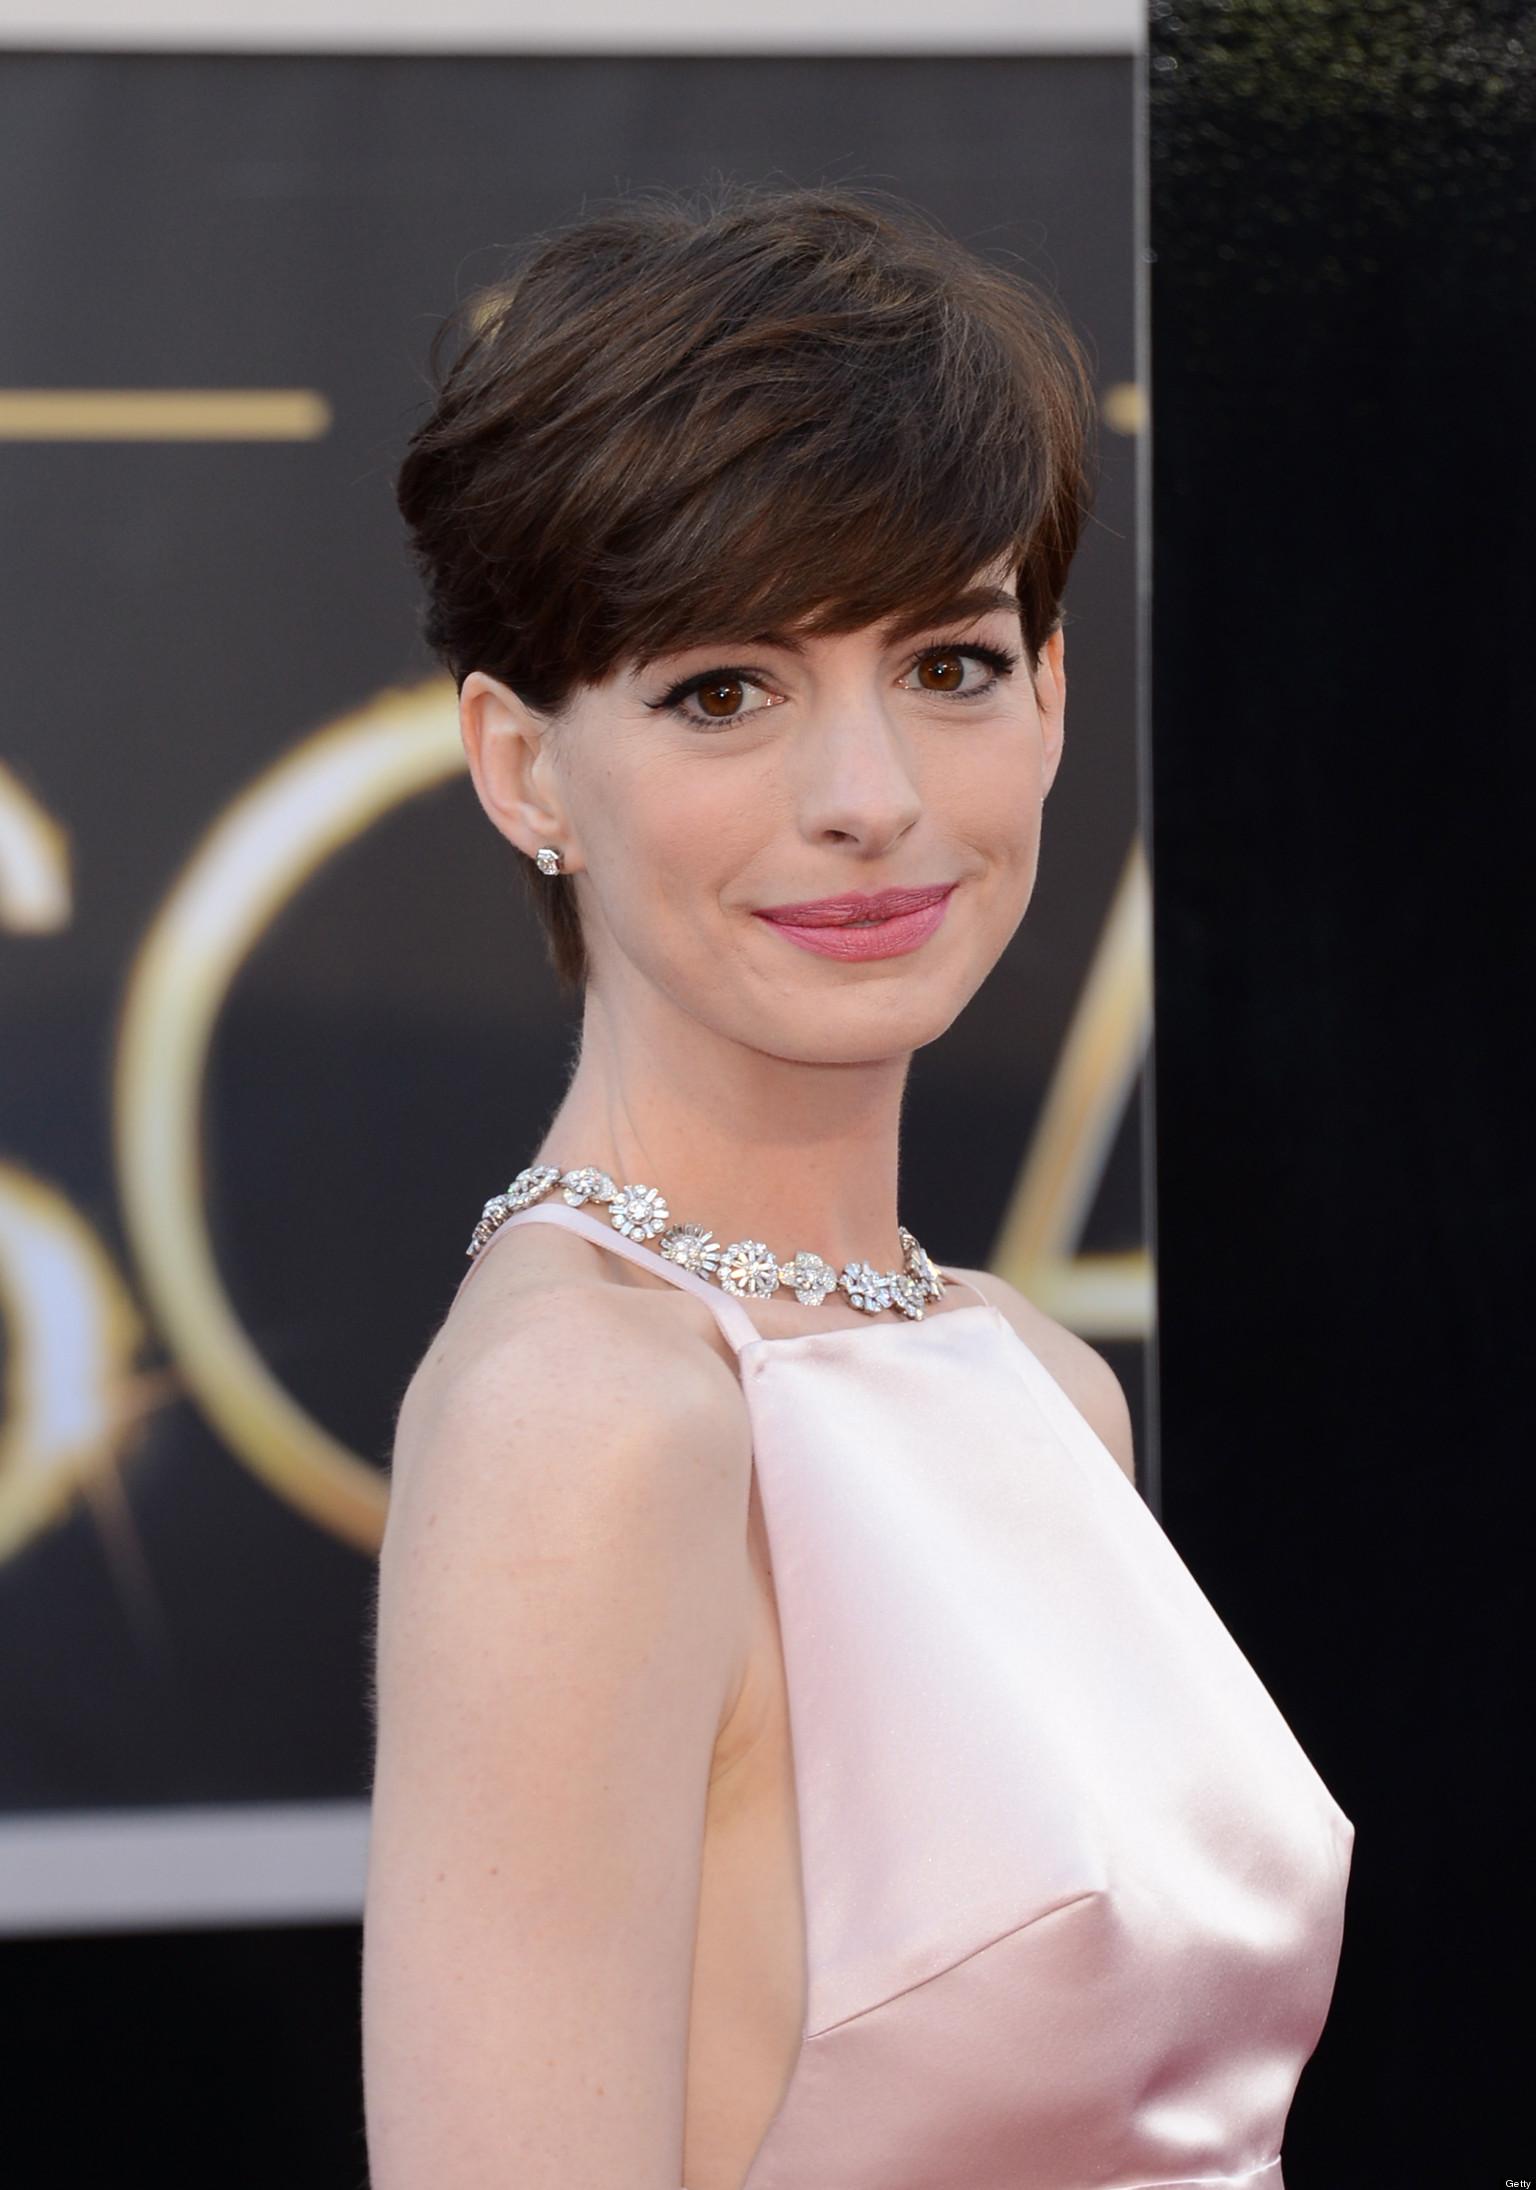 Celebrity Look-Alikes: Anne Hathaway Looks Like This Goya